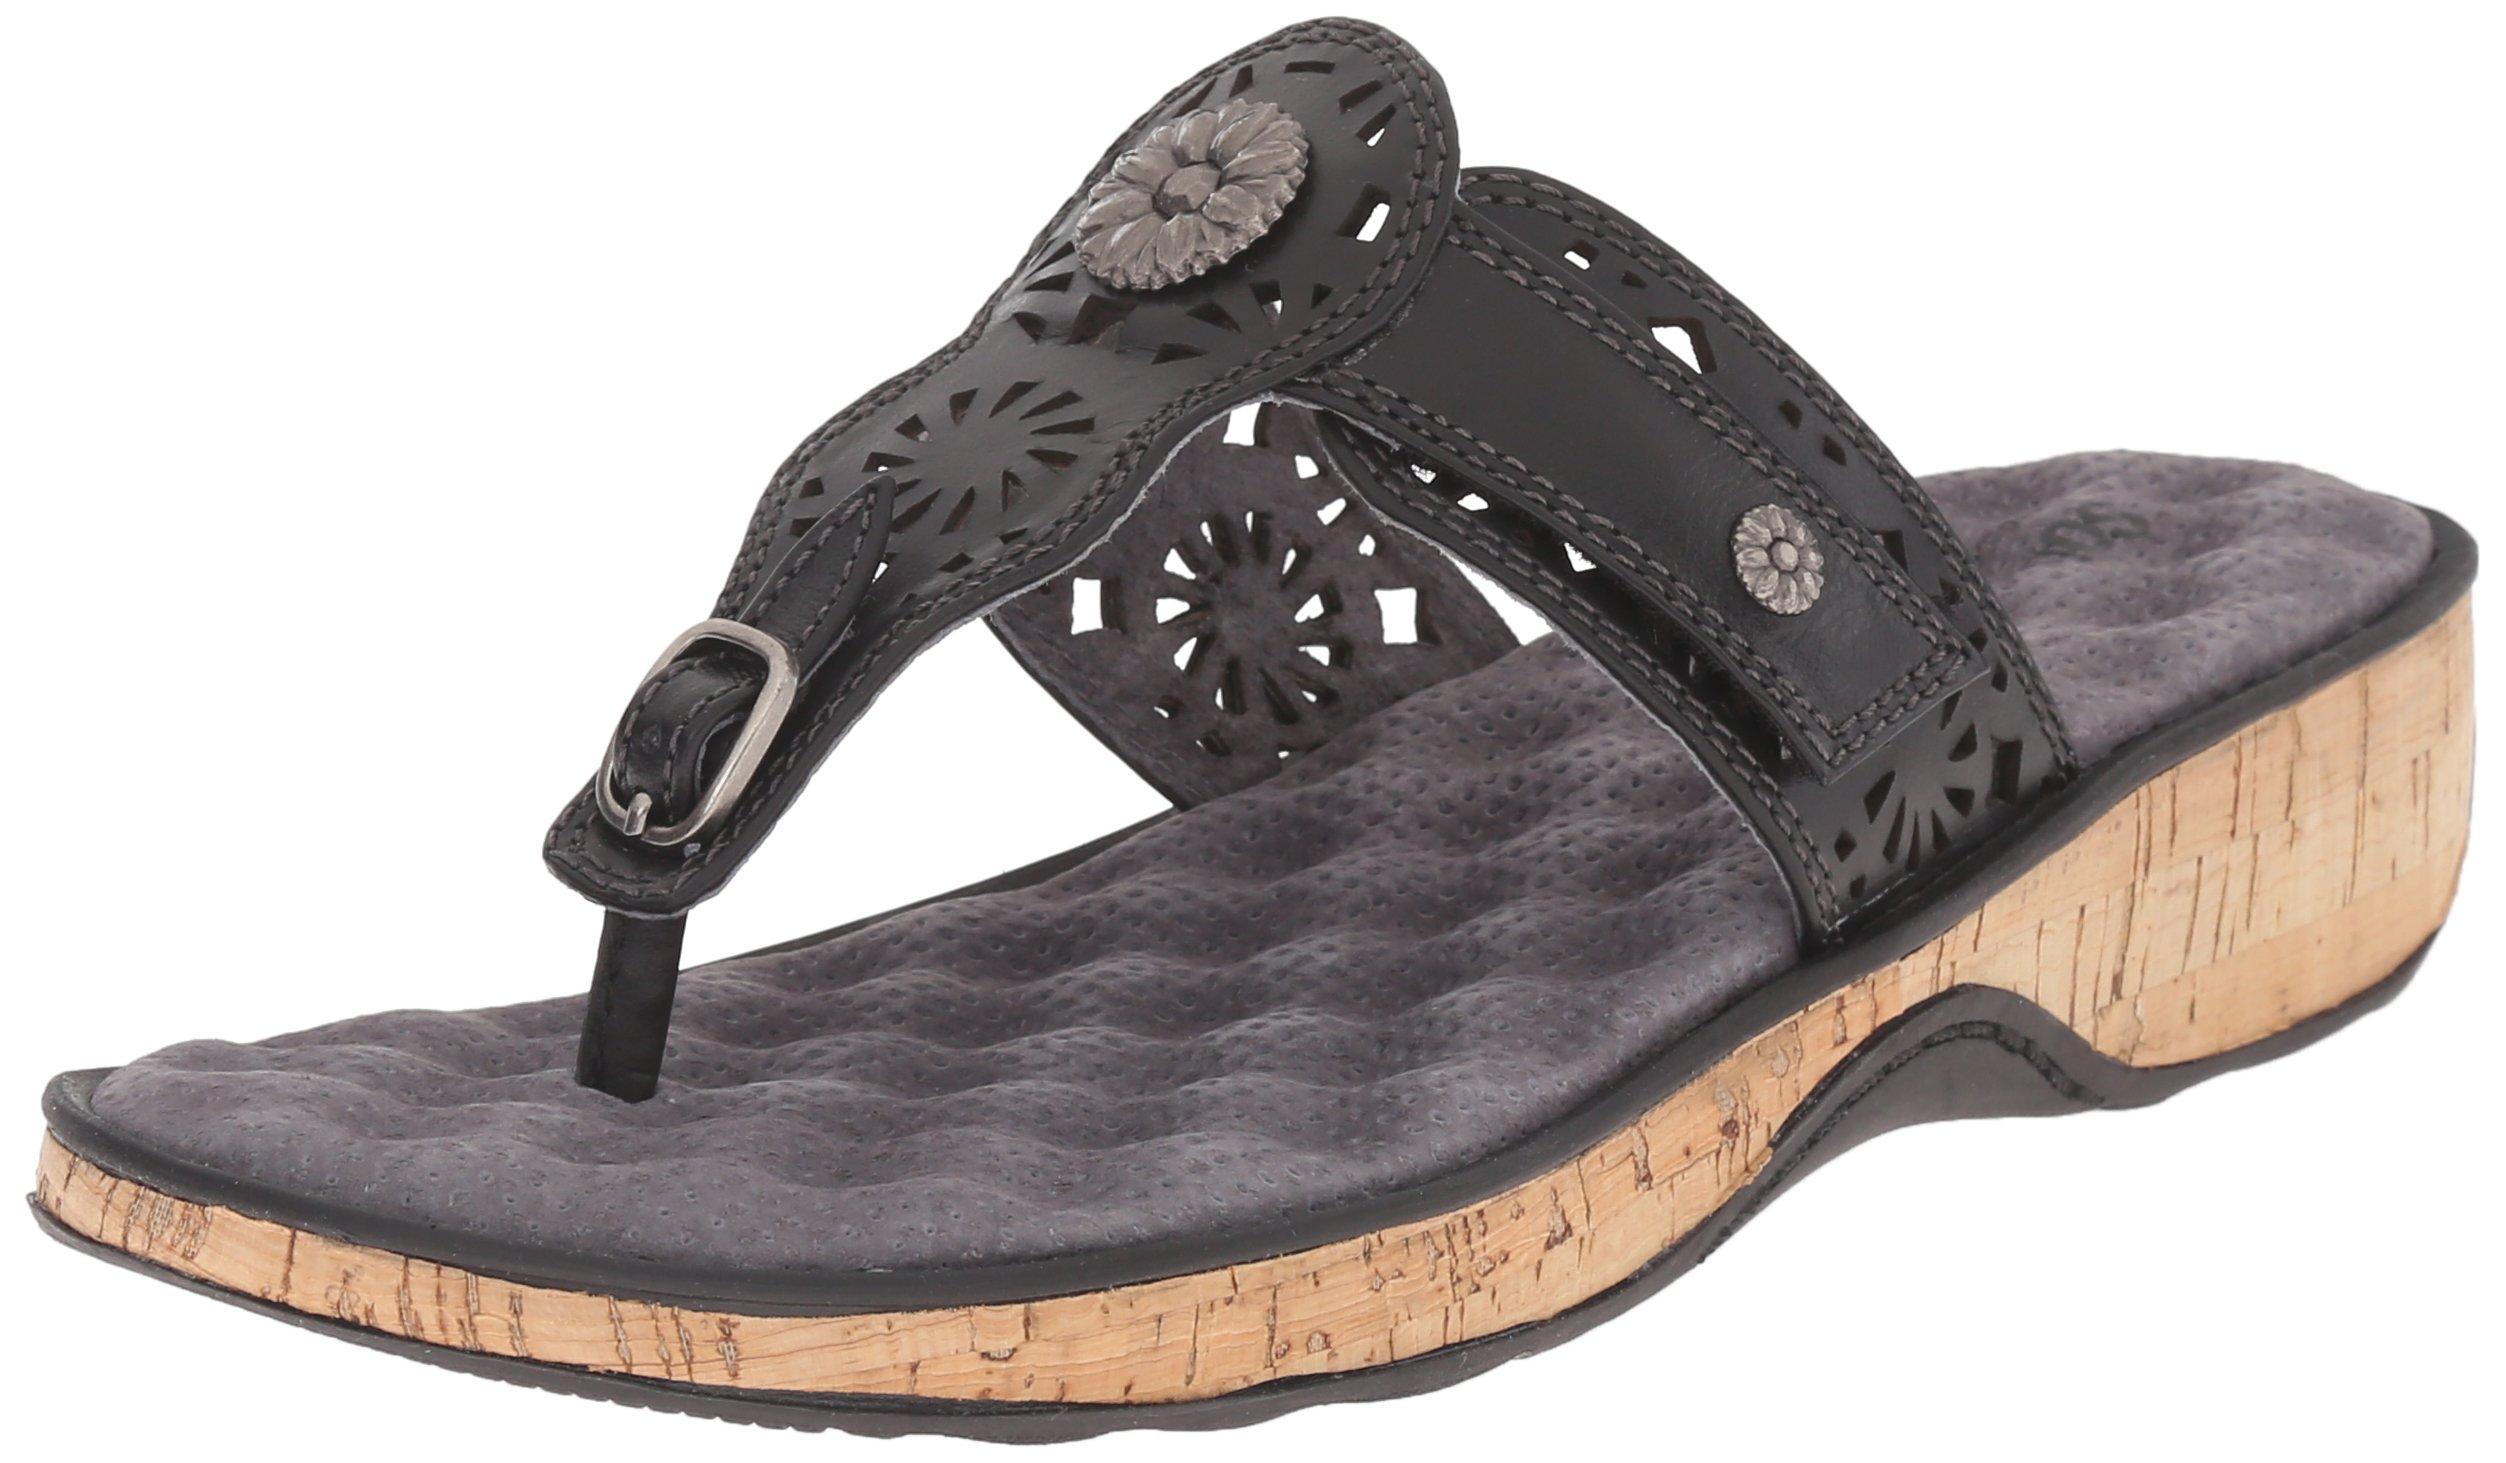 Softwalk Women's Beaumont Slide Sandal, Black, 7 M US